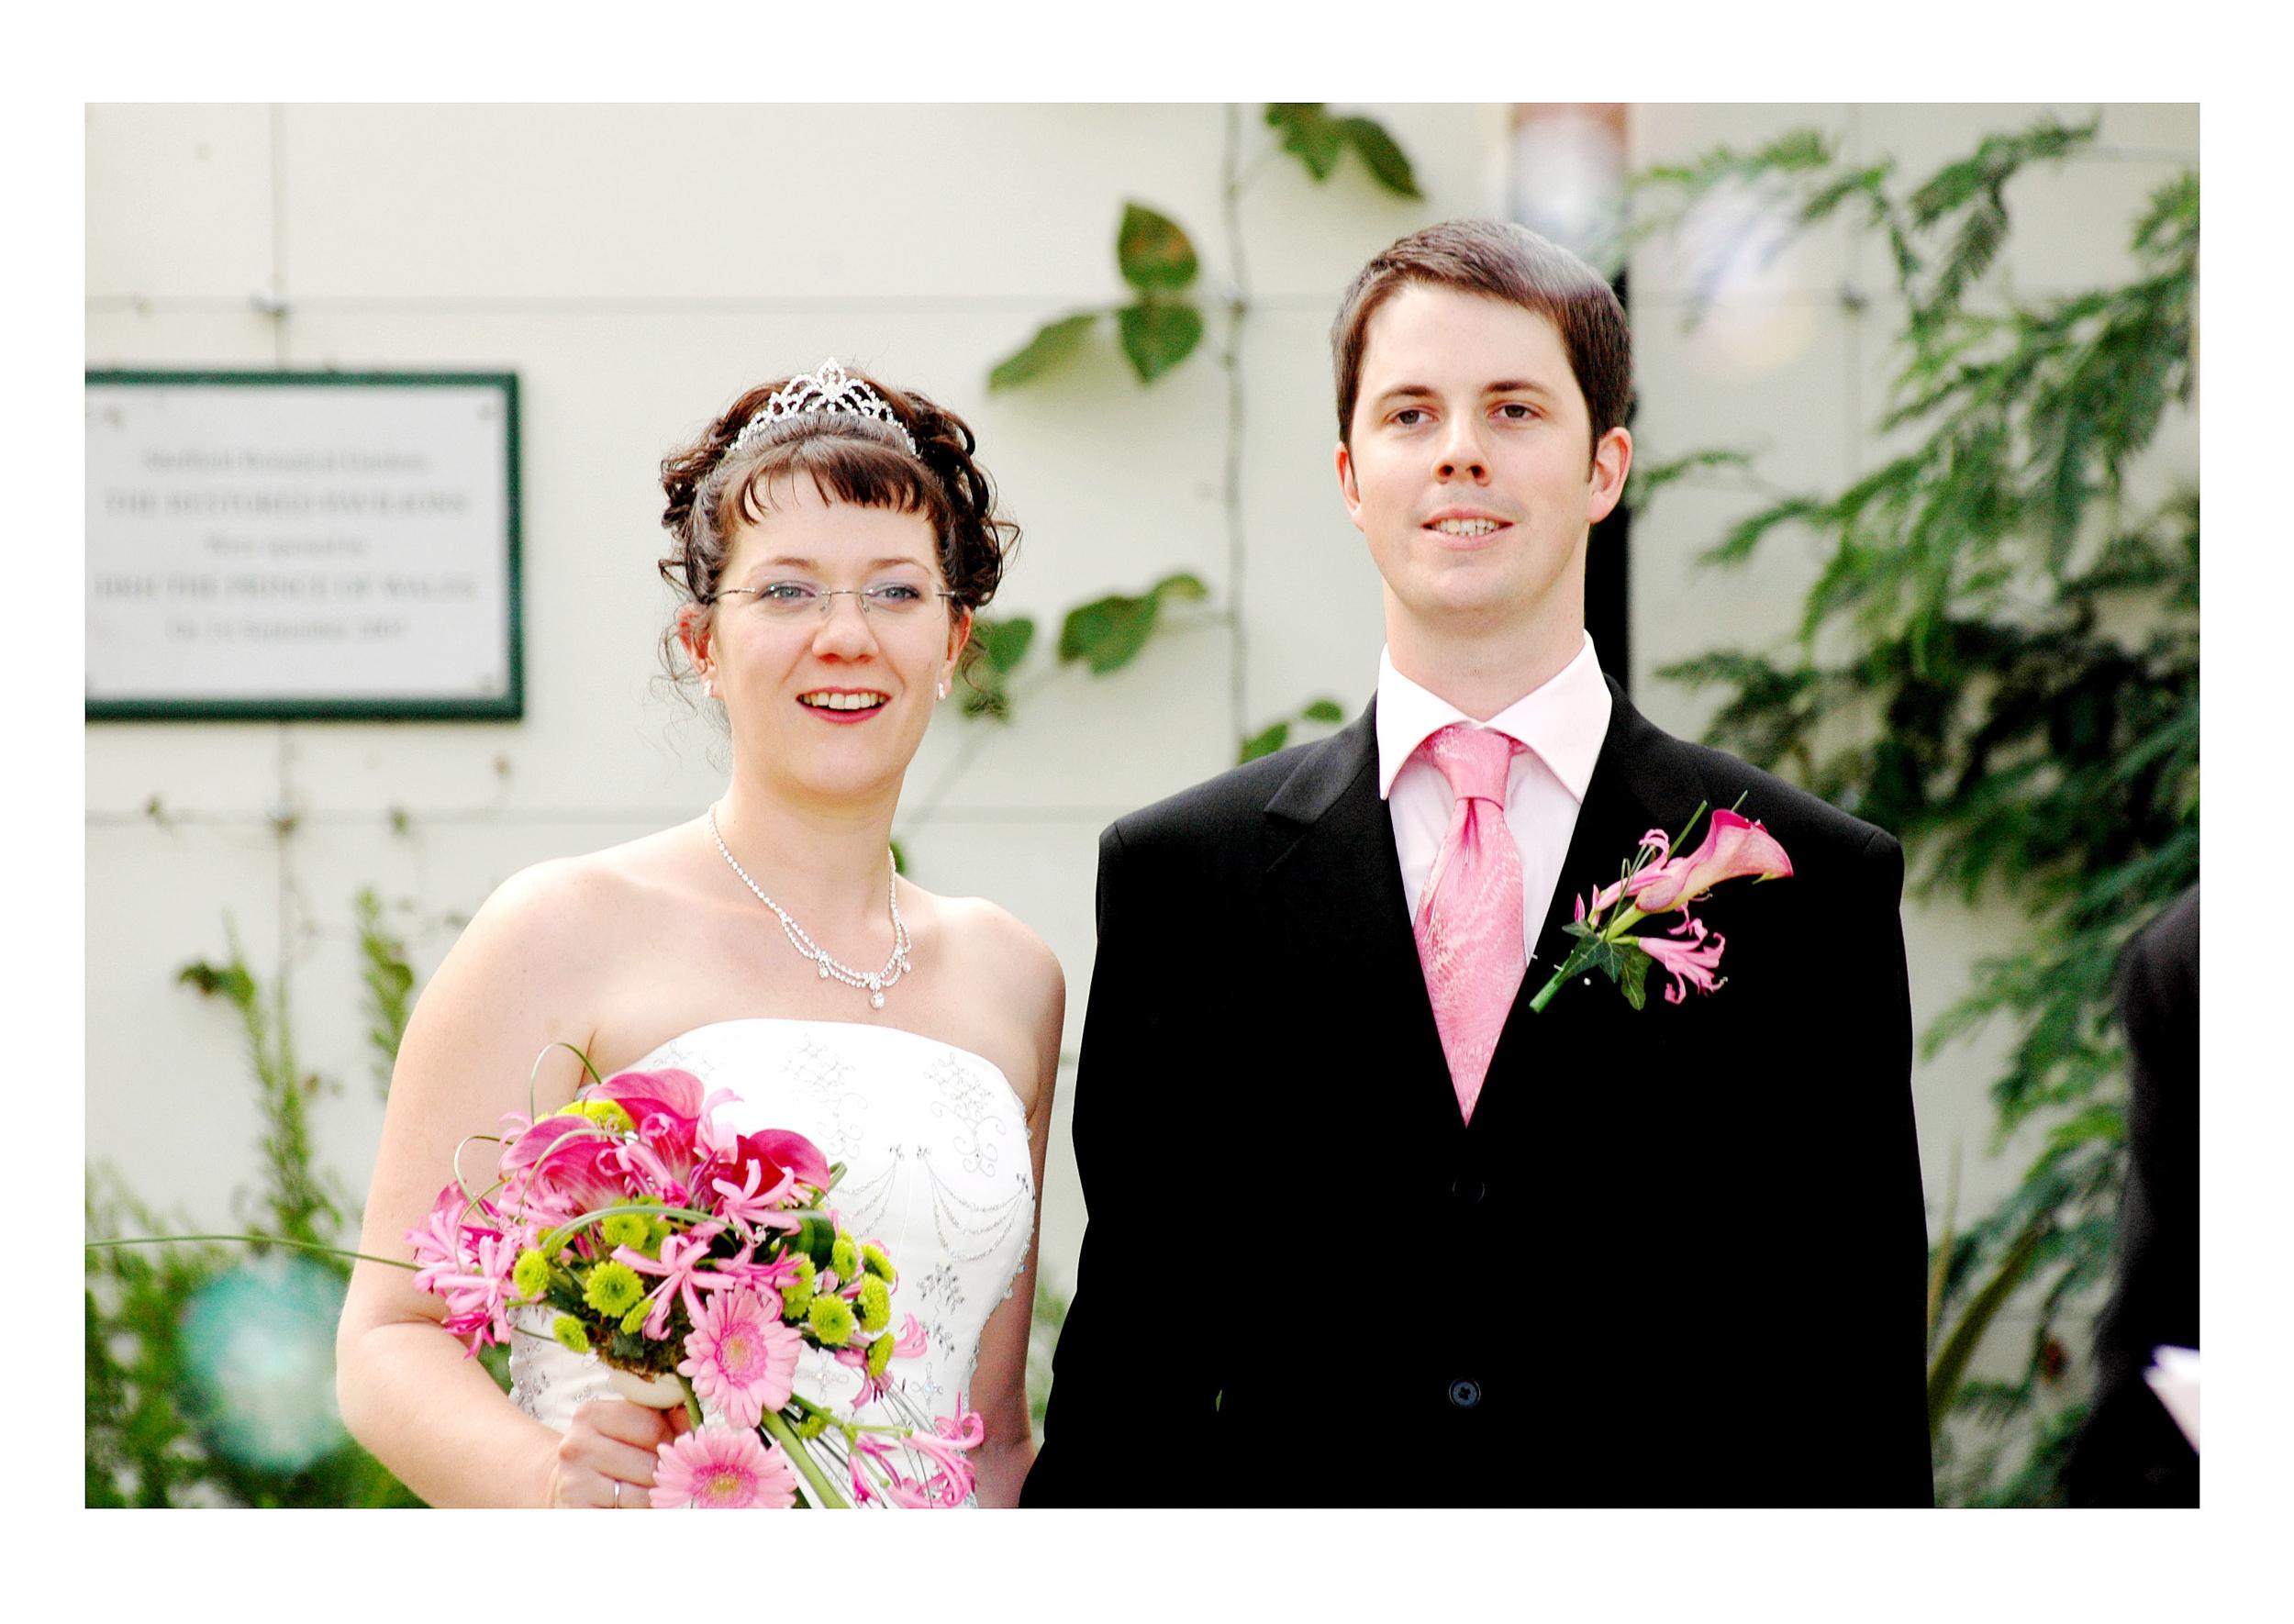 REPORTAGE-WEDDING-PHOTOGRAPHY-SET-UK-24.jpg